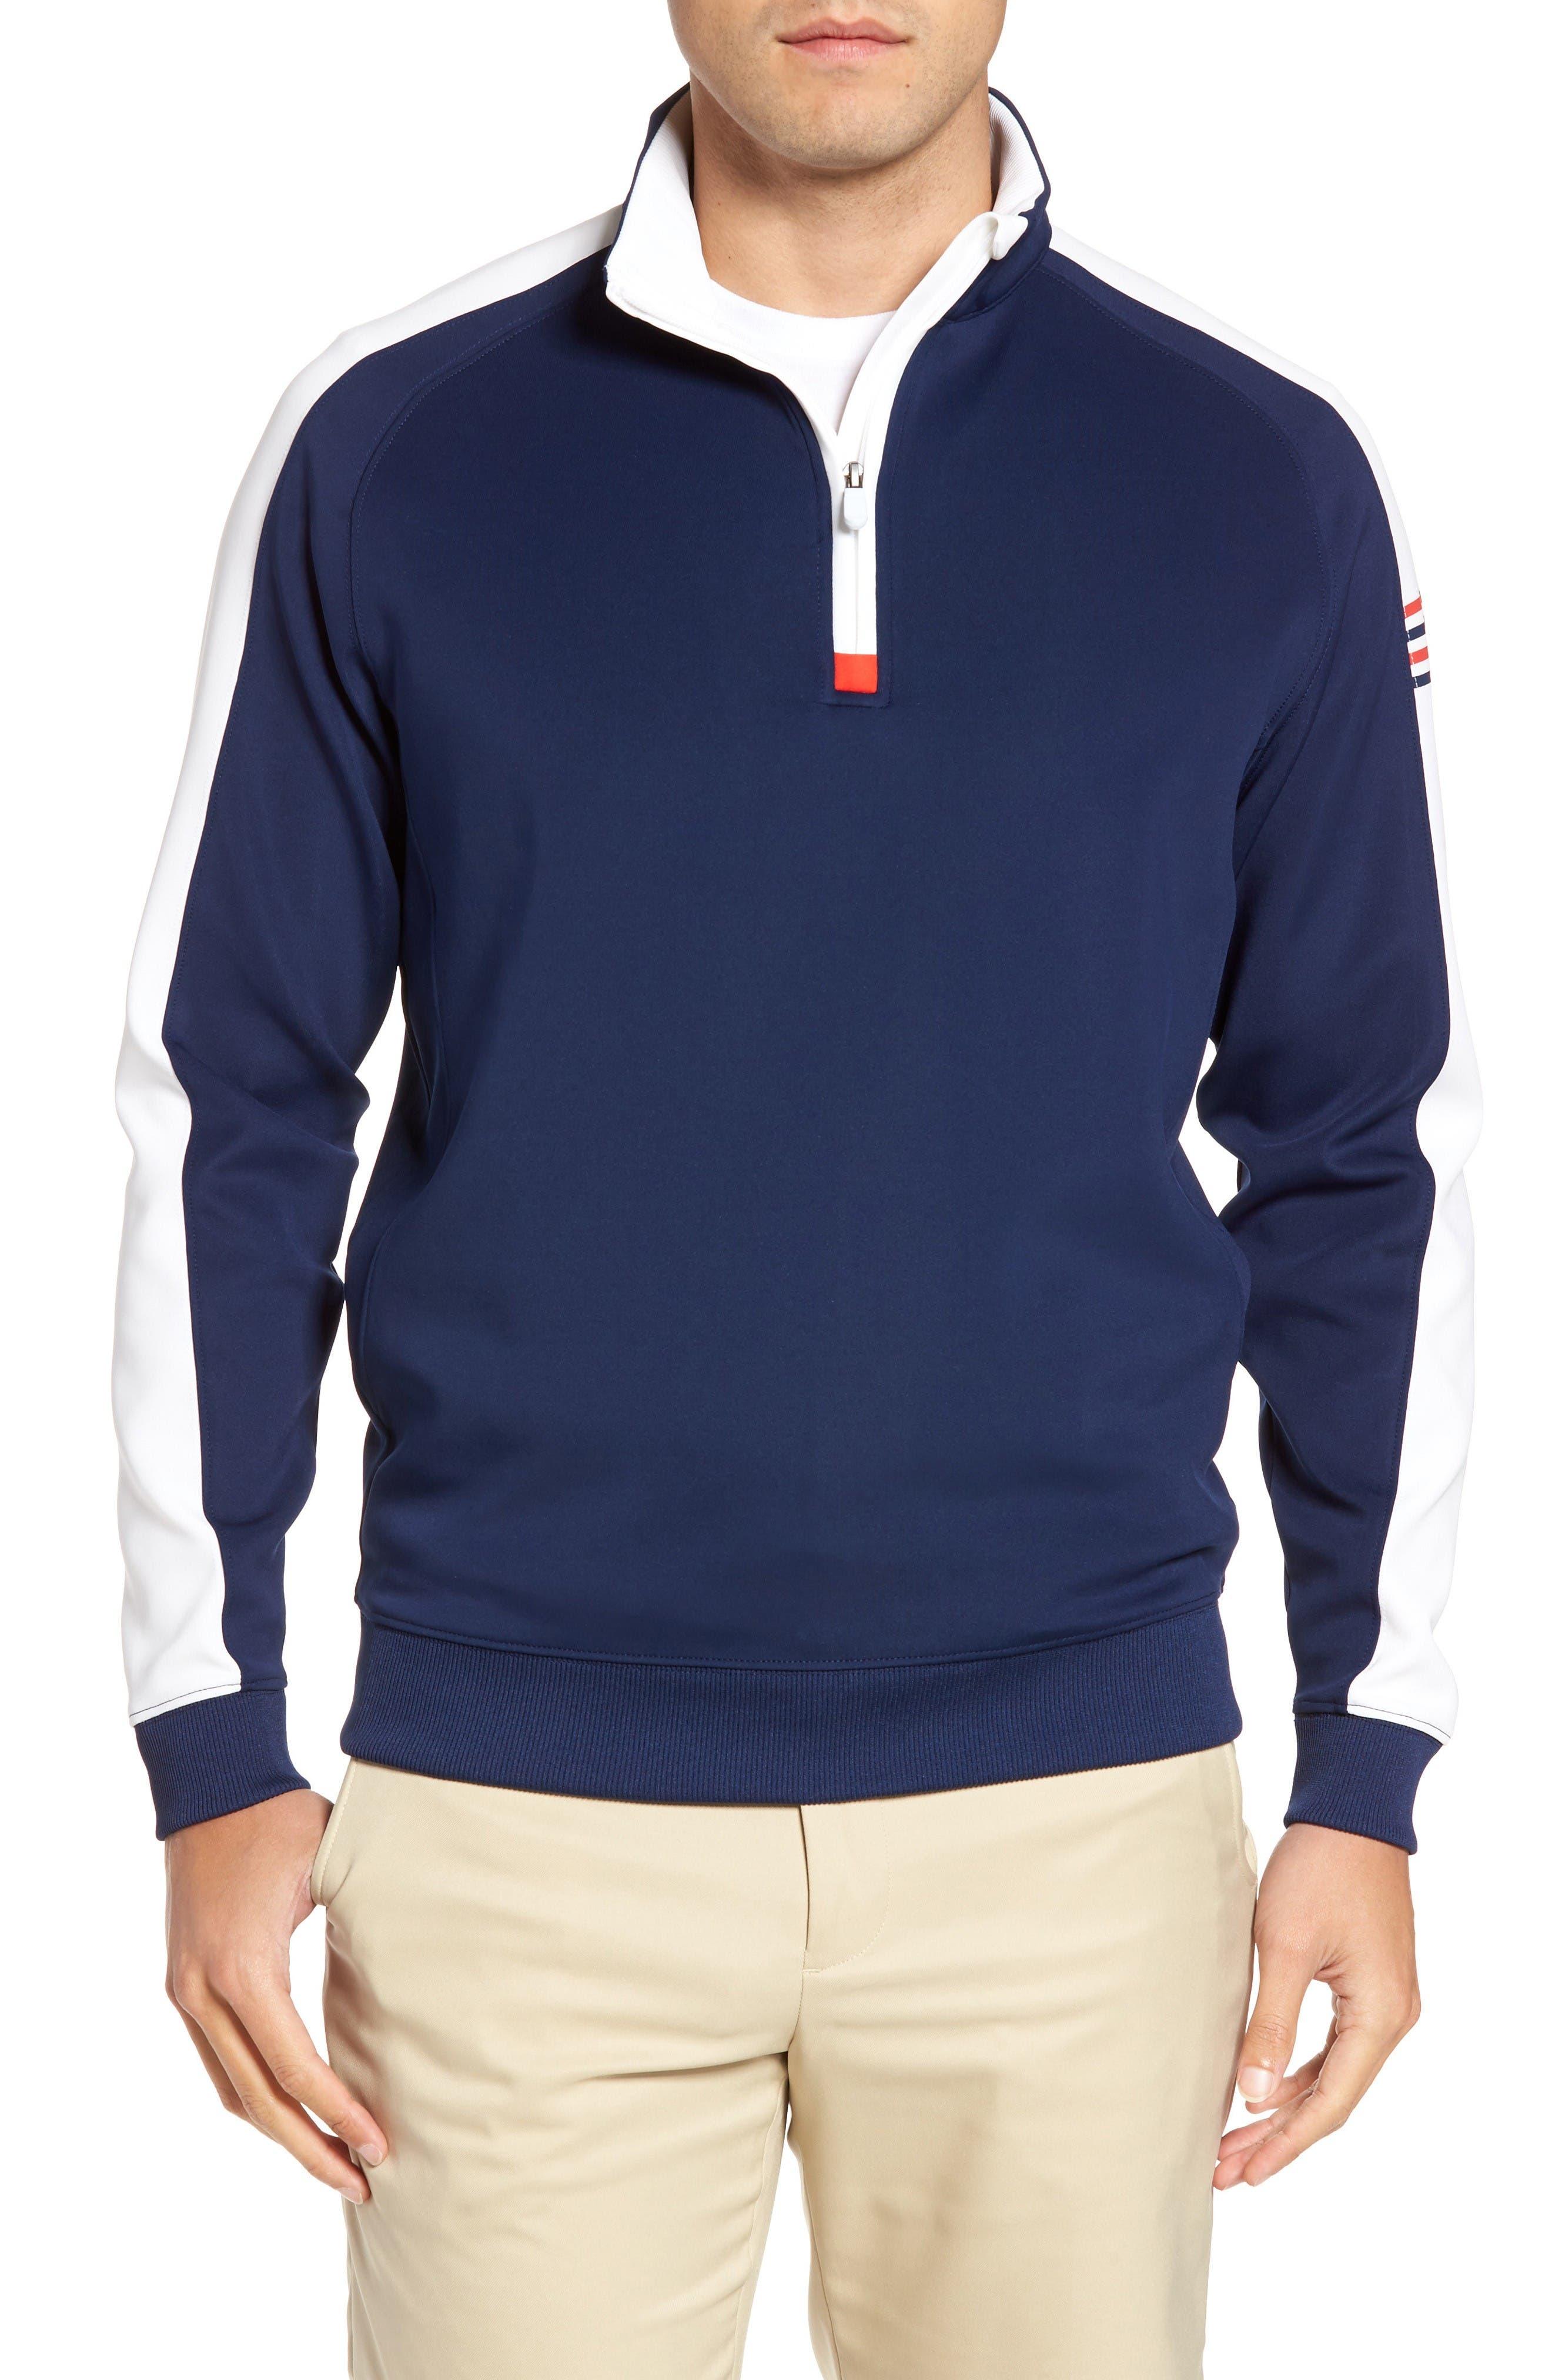 Alternate Image 1 Selected - Bobby Jones XH20 Tech Quarter Zip Sweater